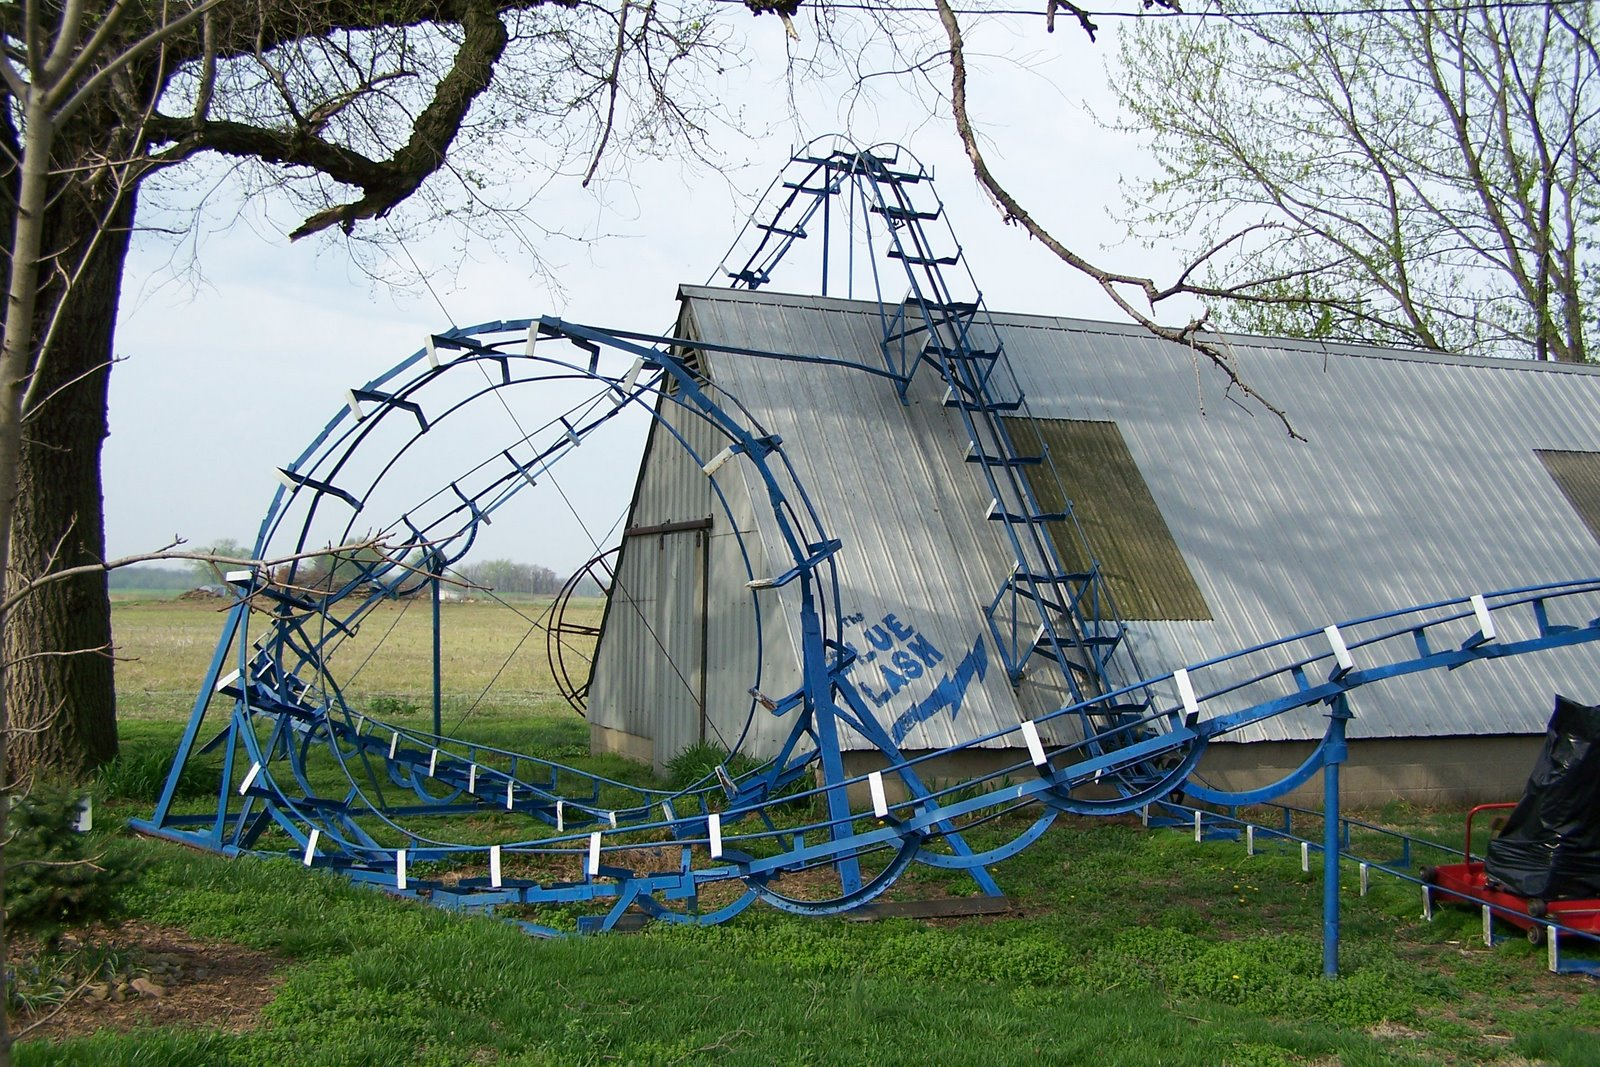 Huge Backyard Roller Coaster :  miniature, fully operational roller coaster in a man?s back yard